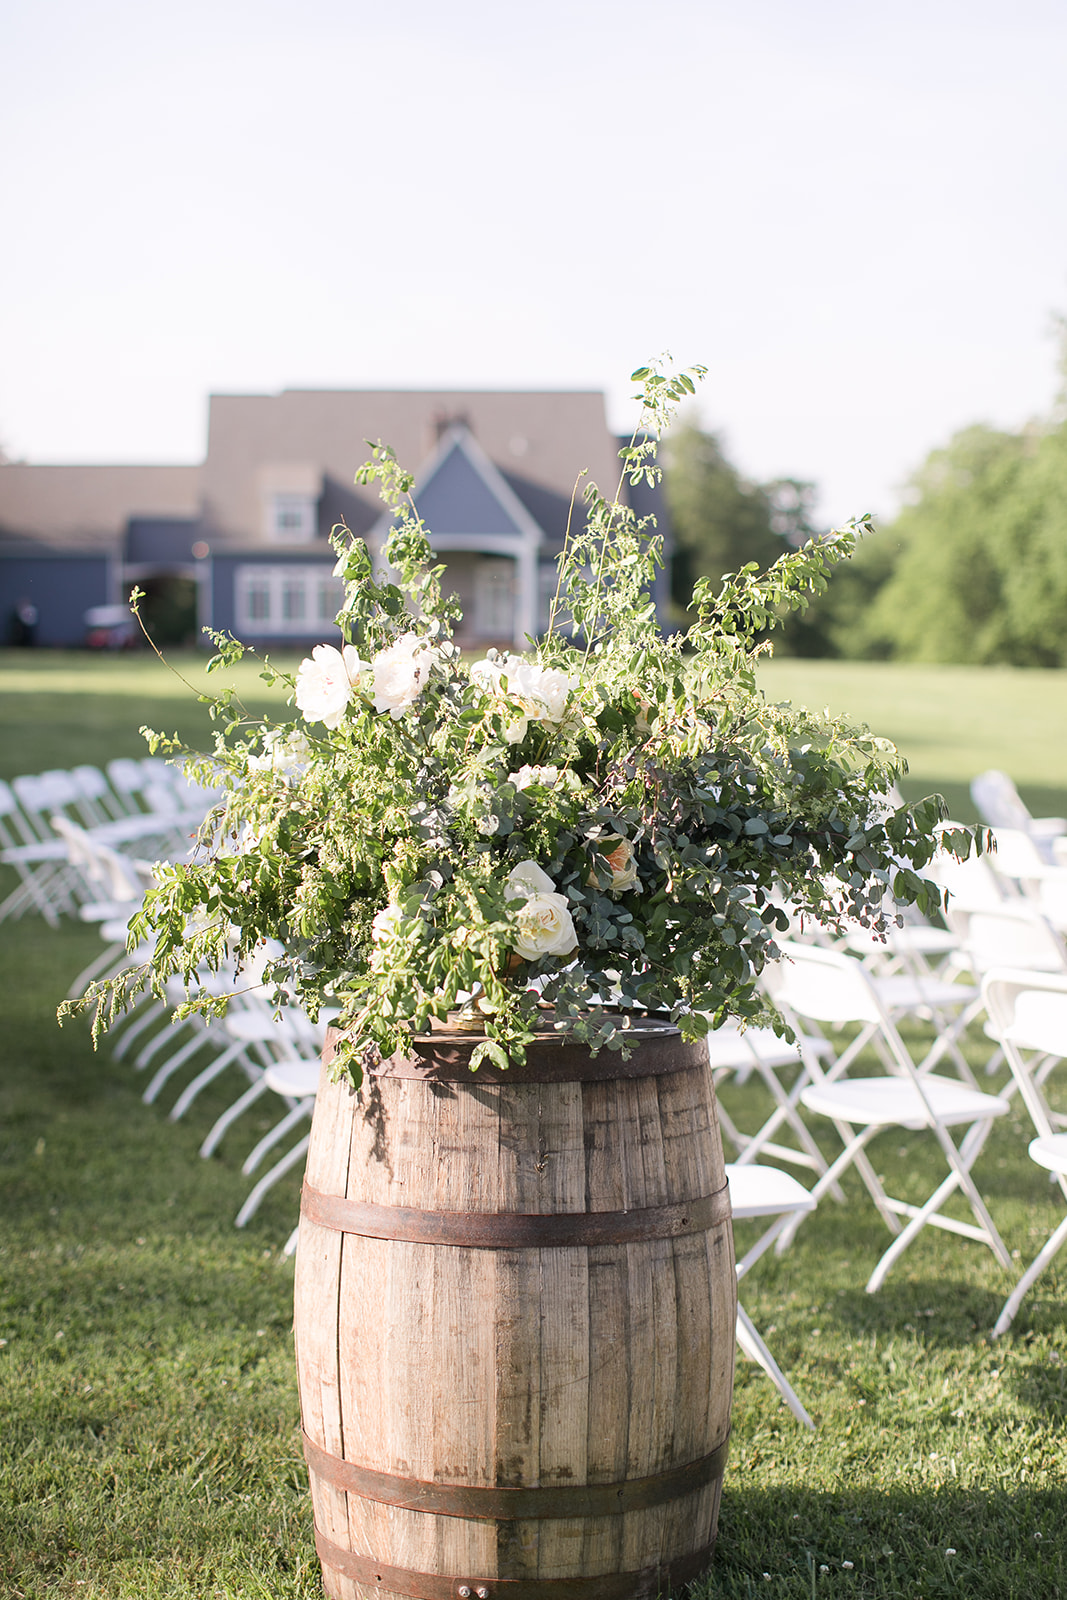 Abbey-Colby-wedding-70_websize.jpg